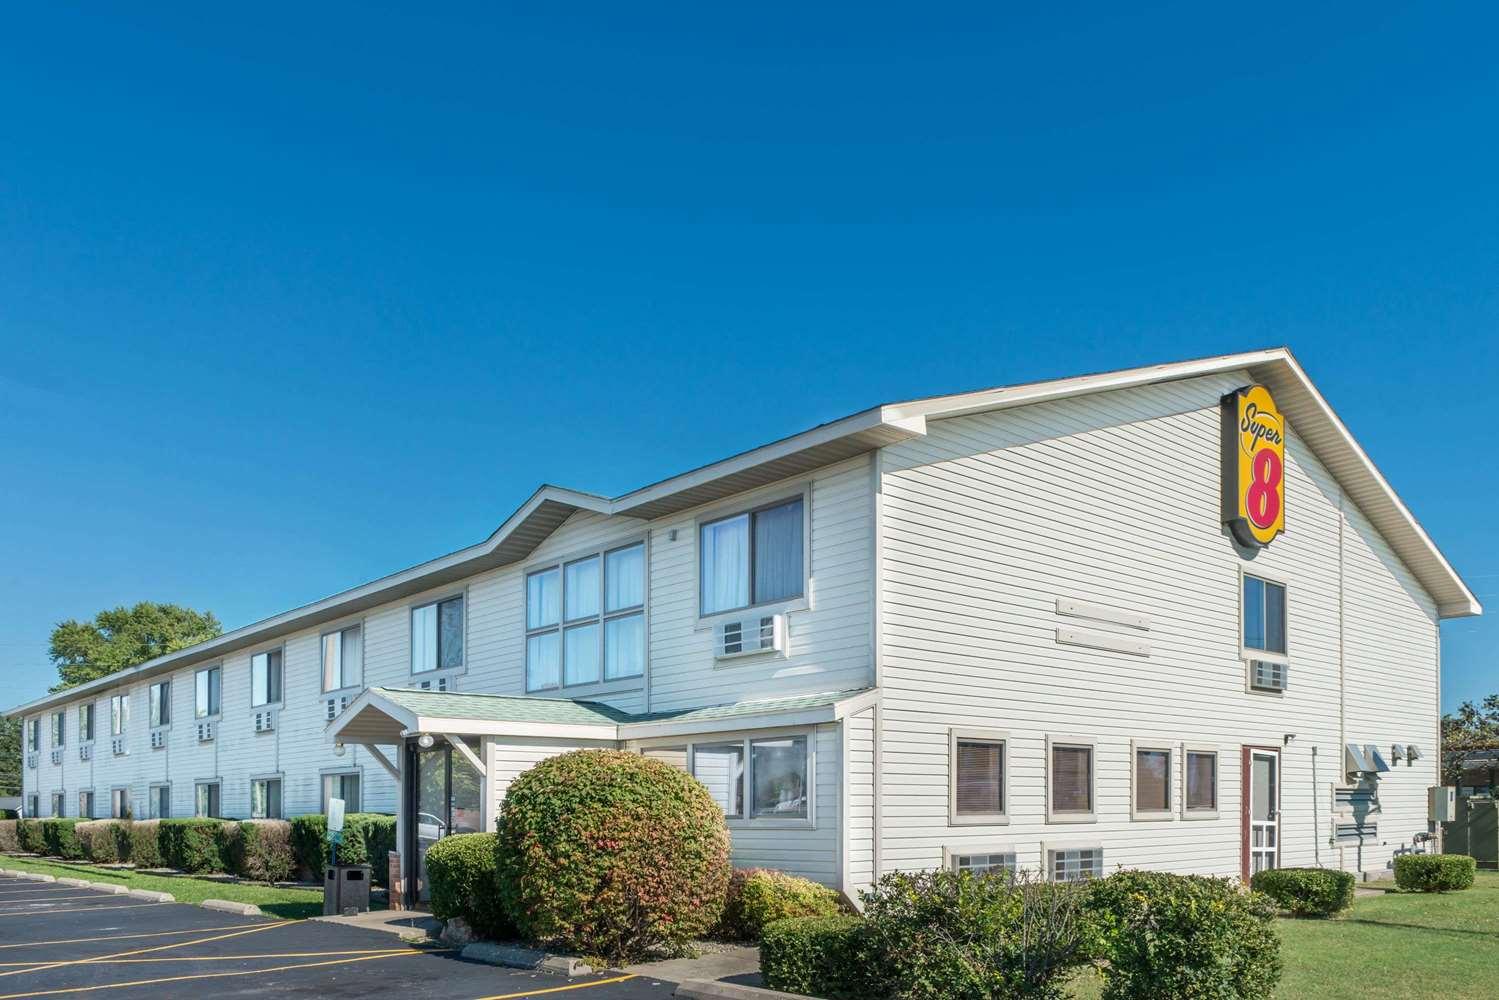 Super 8 Hotel Du Quoin  Il